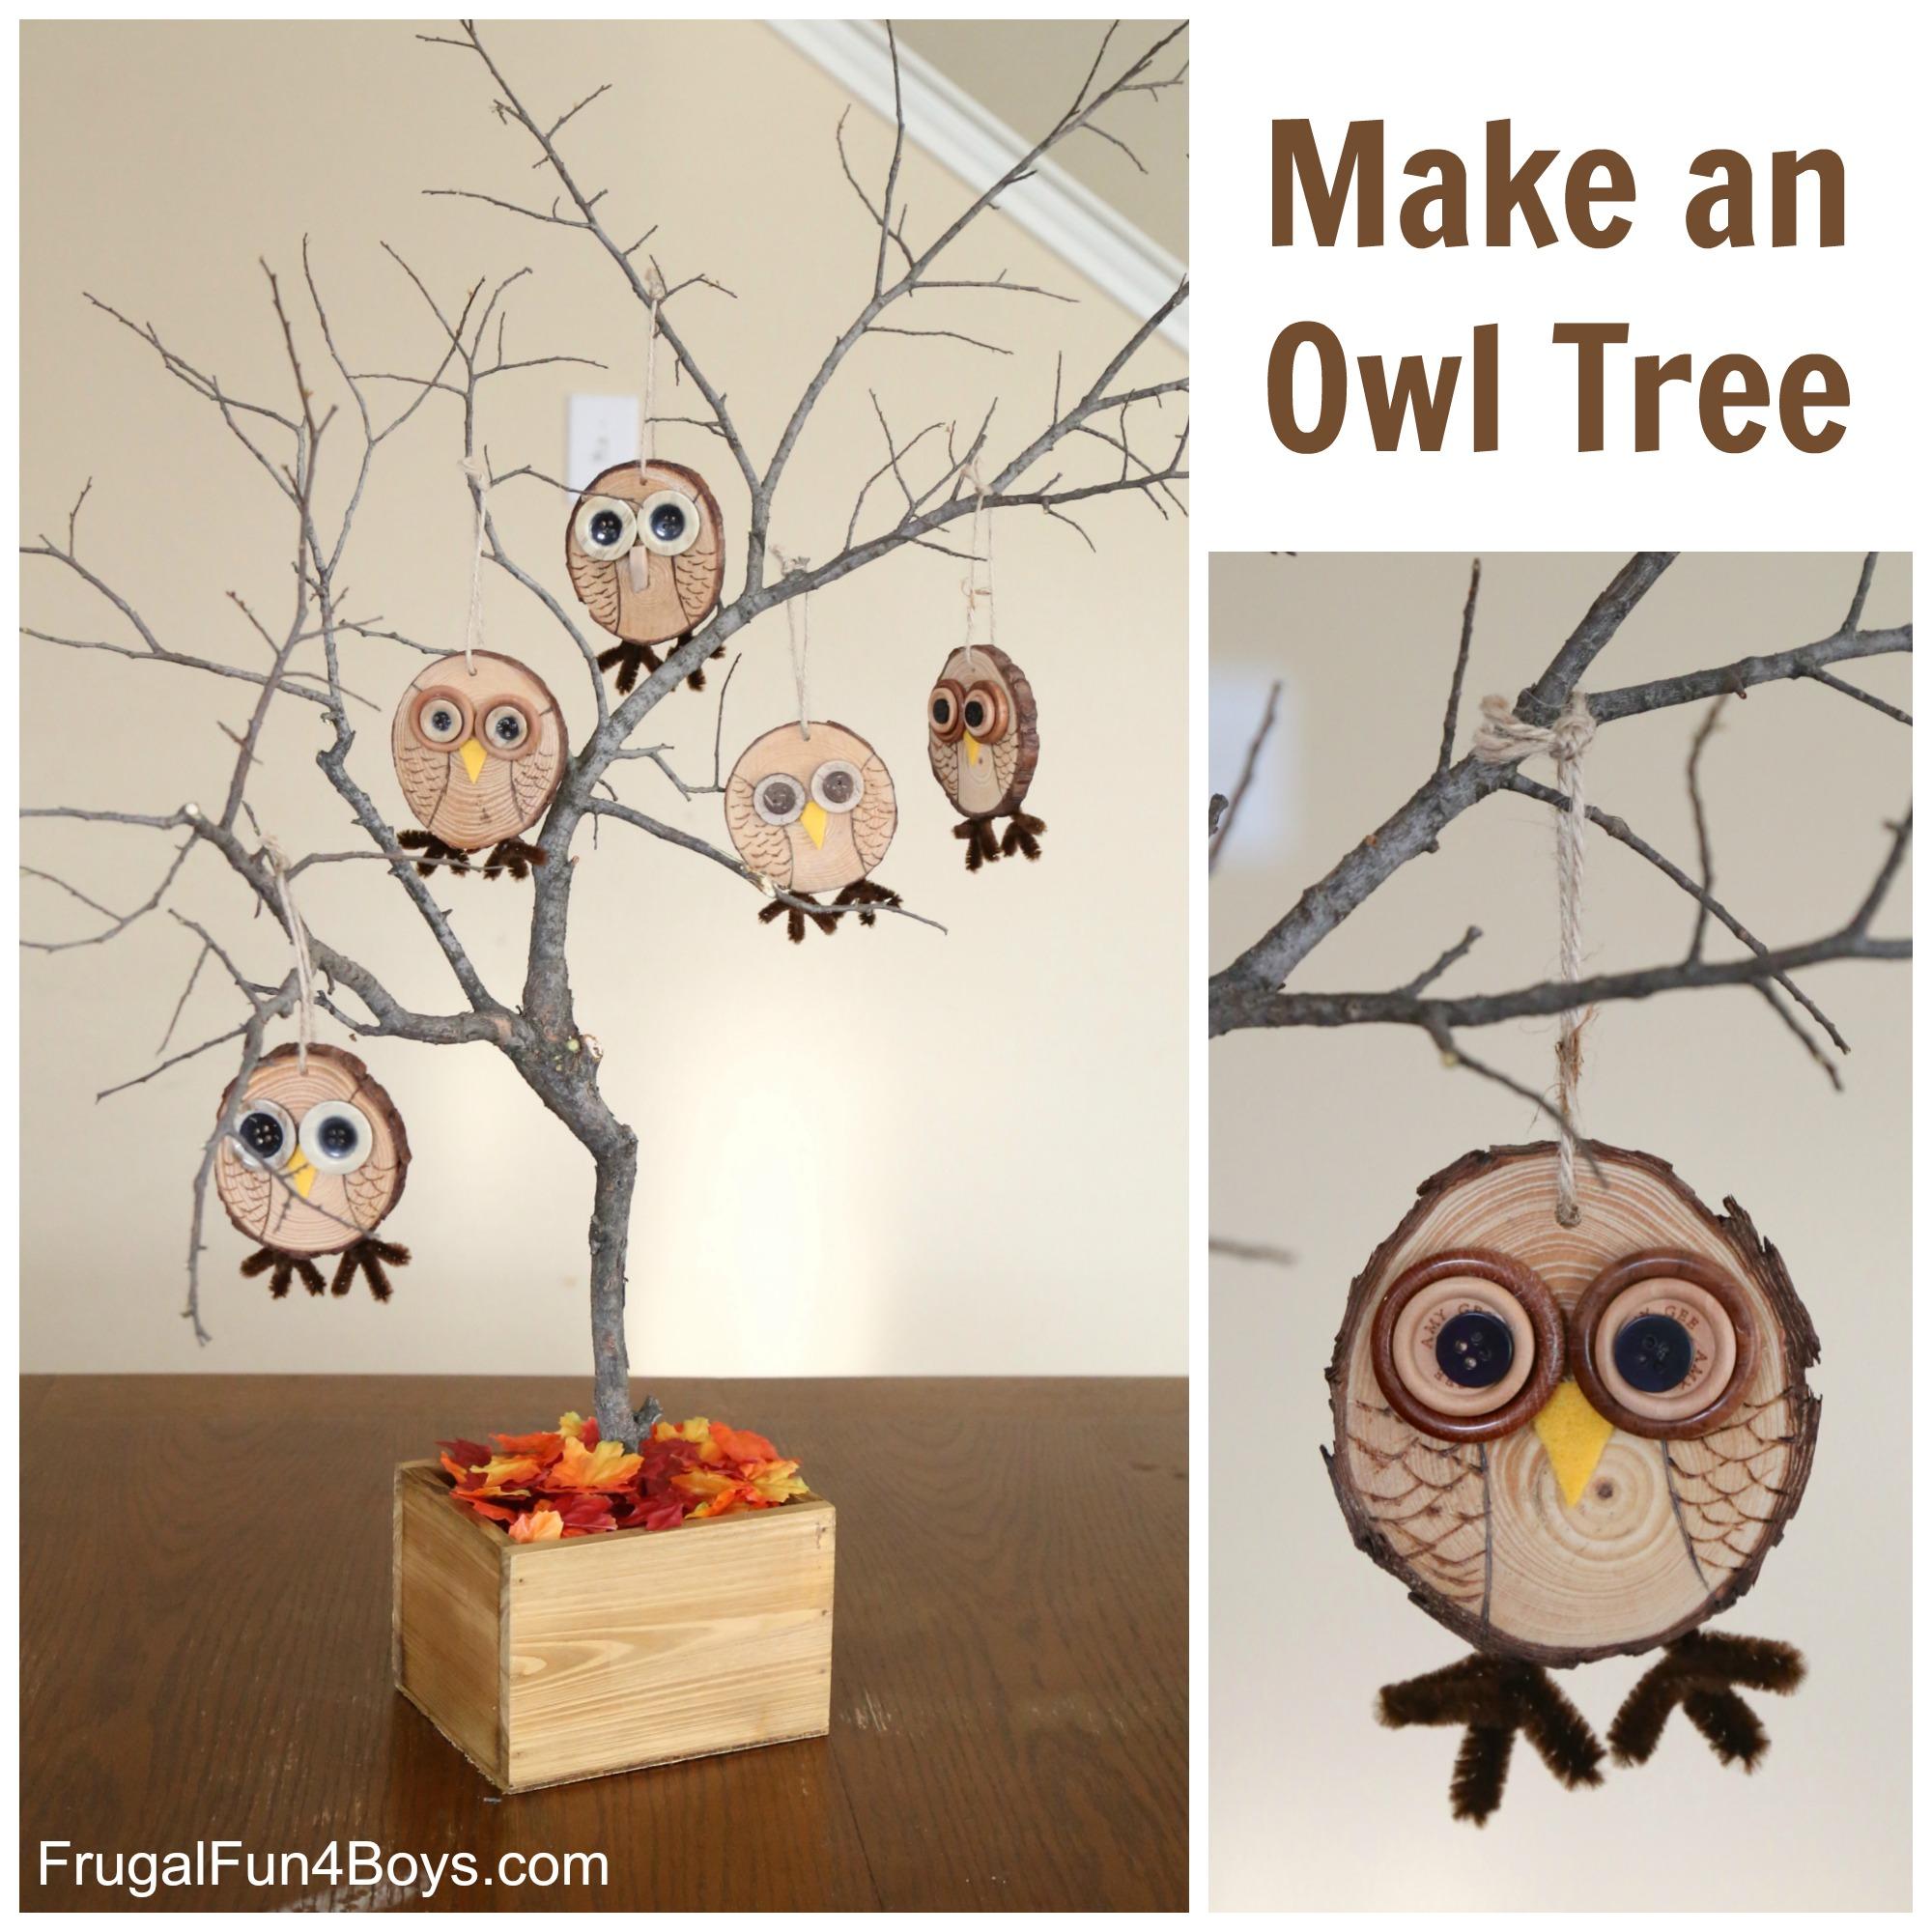 Make an Owl Tree - Wood Slice Owl Ornament Craft